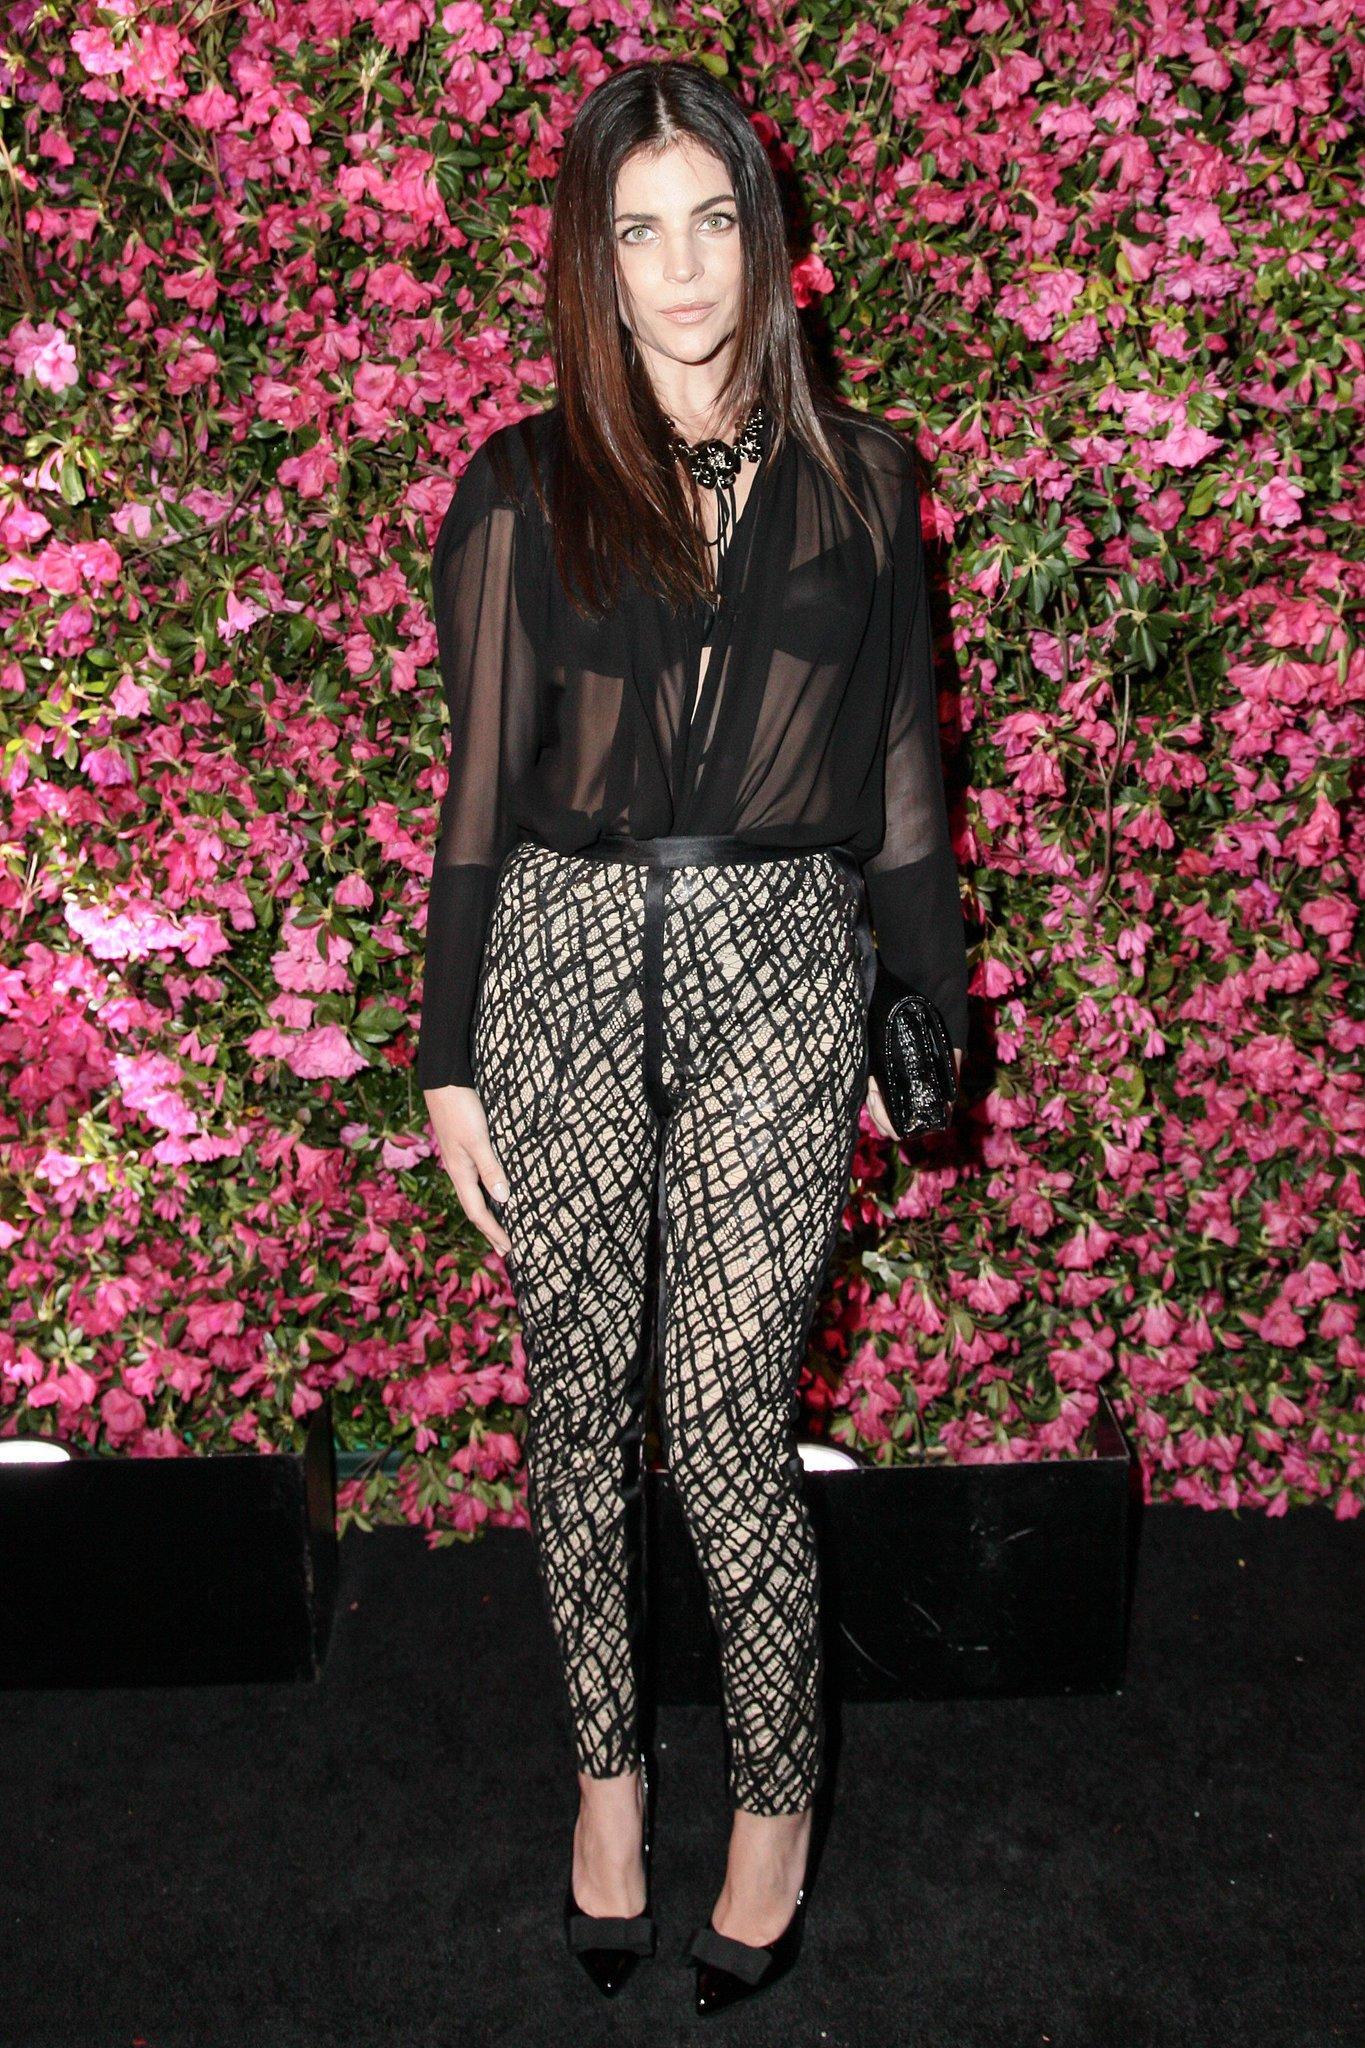 Julia Restoin Roitfeld wore Fall 2012 Chanel trousers at Chanel's Tribeca Film Festival Artists Dinner in New York. Source: Matteo Prandoni/BFAnyc.com